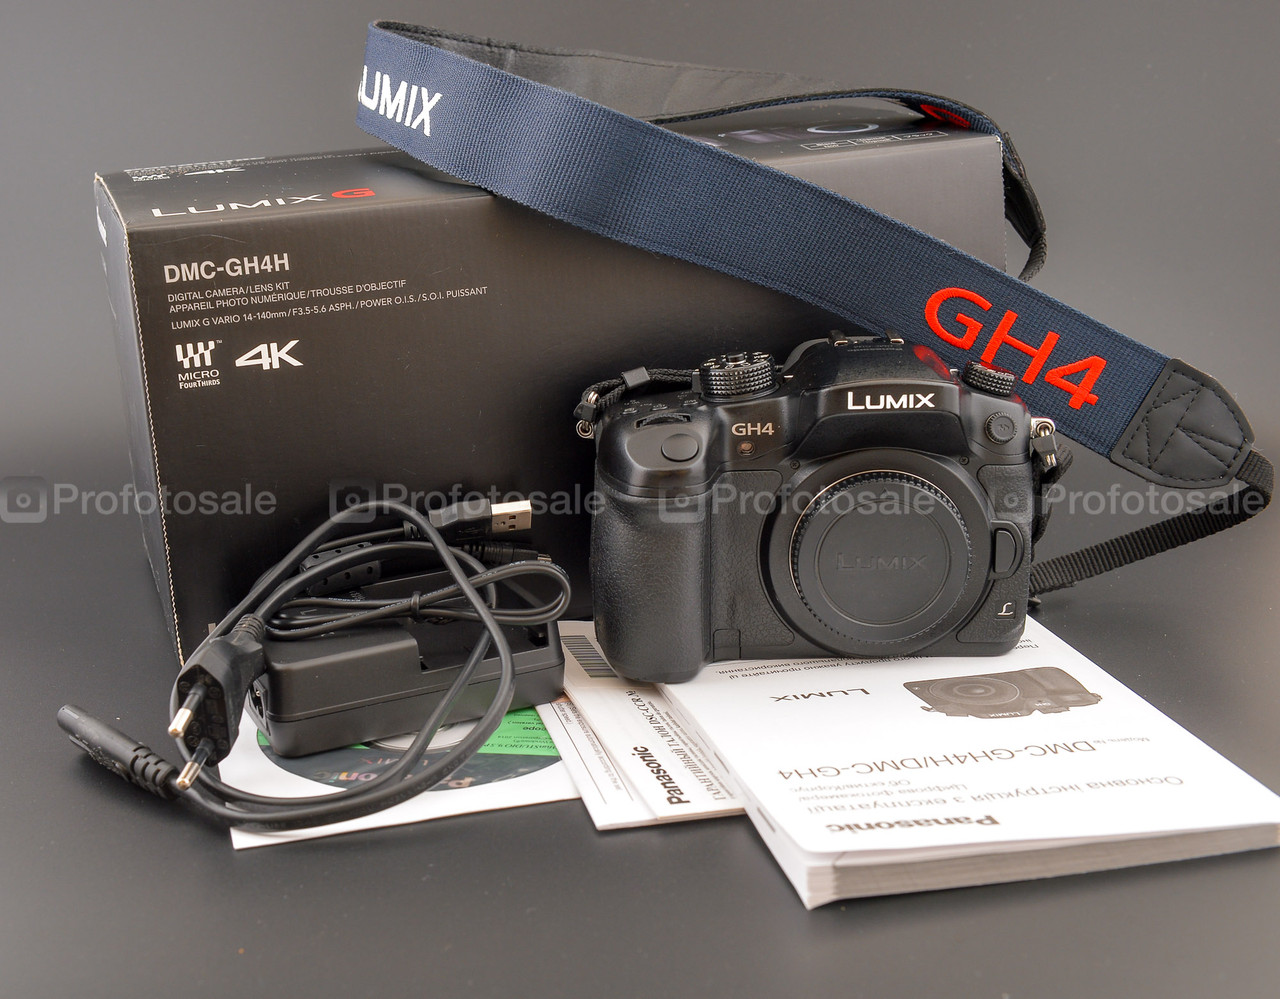 Panasonic GH-4